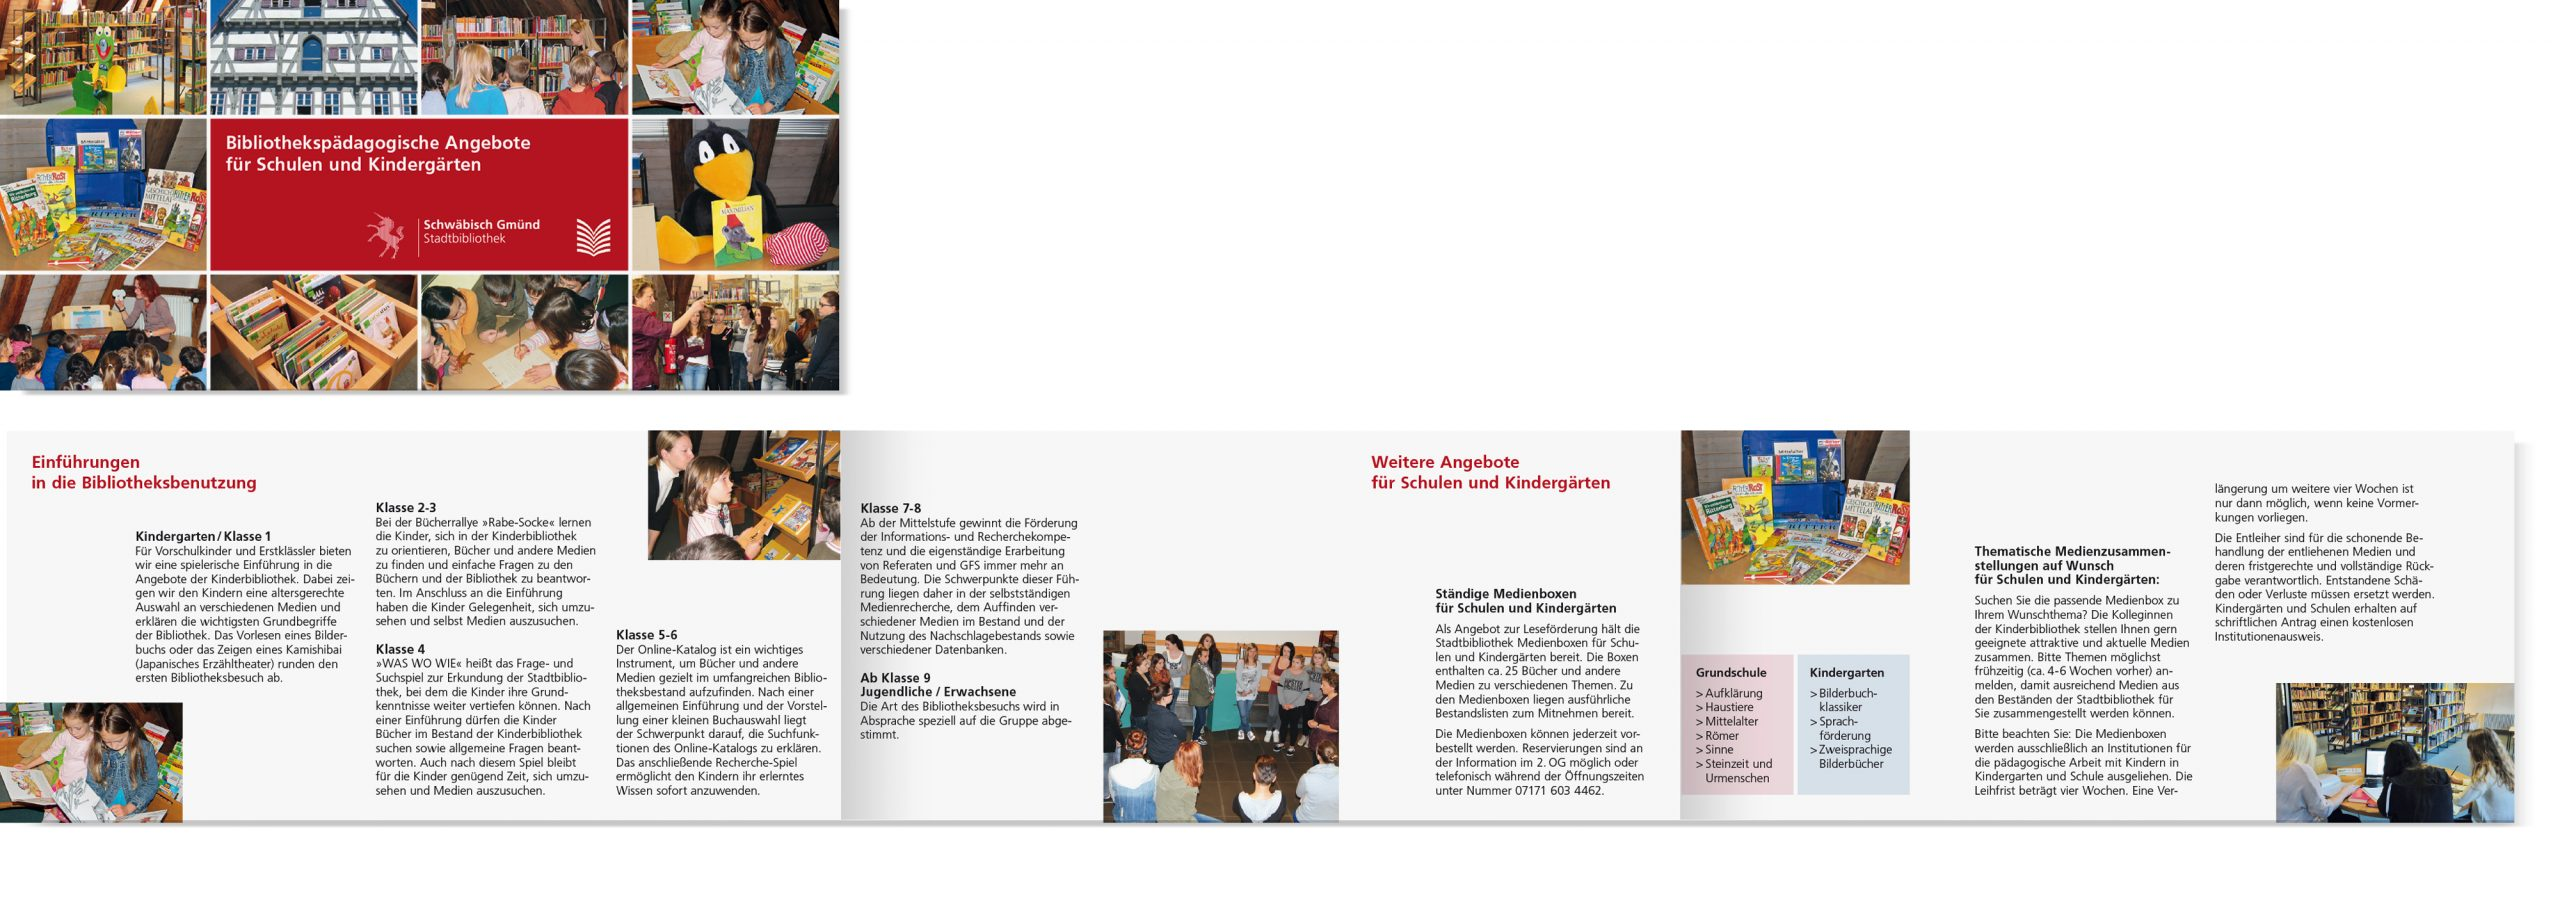 fh-web-bibliothek-flyer-schulen-scaled.jpg